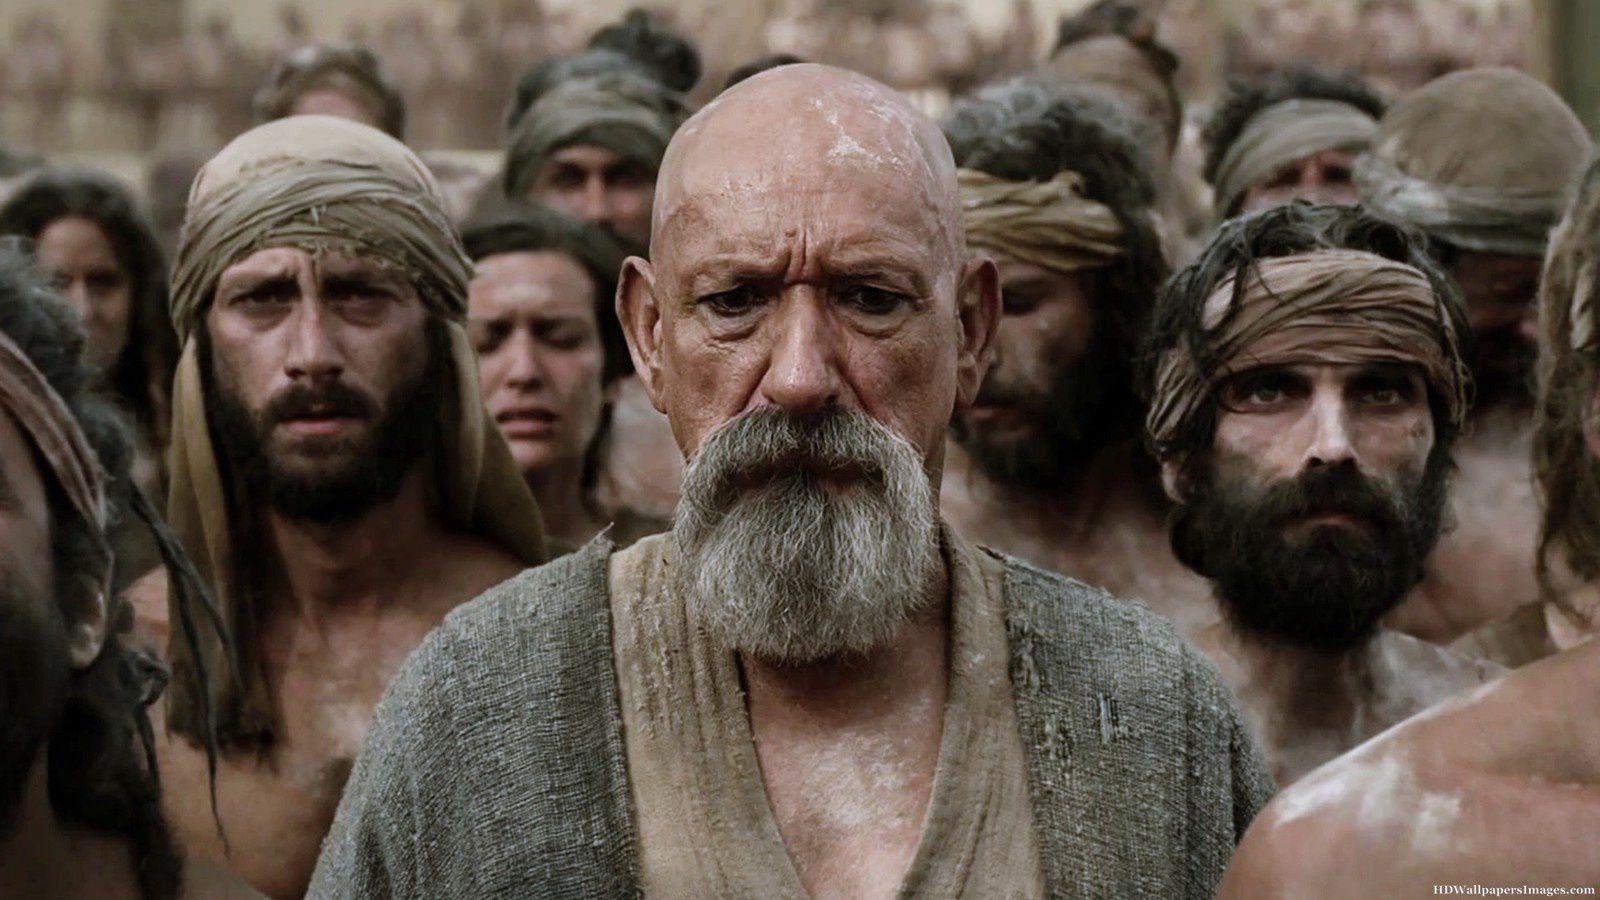 Le film Exodus Gods and Kings ... et ses mensonges